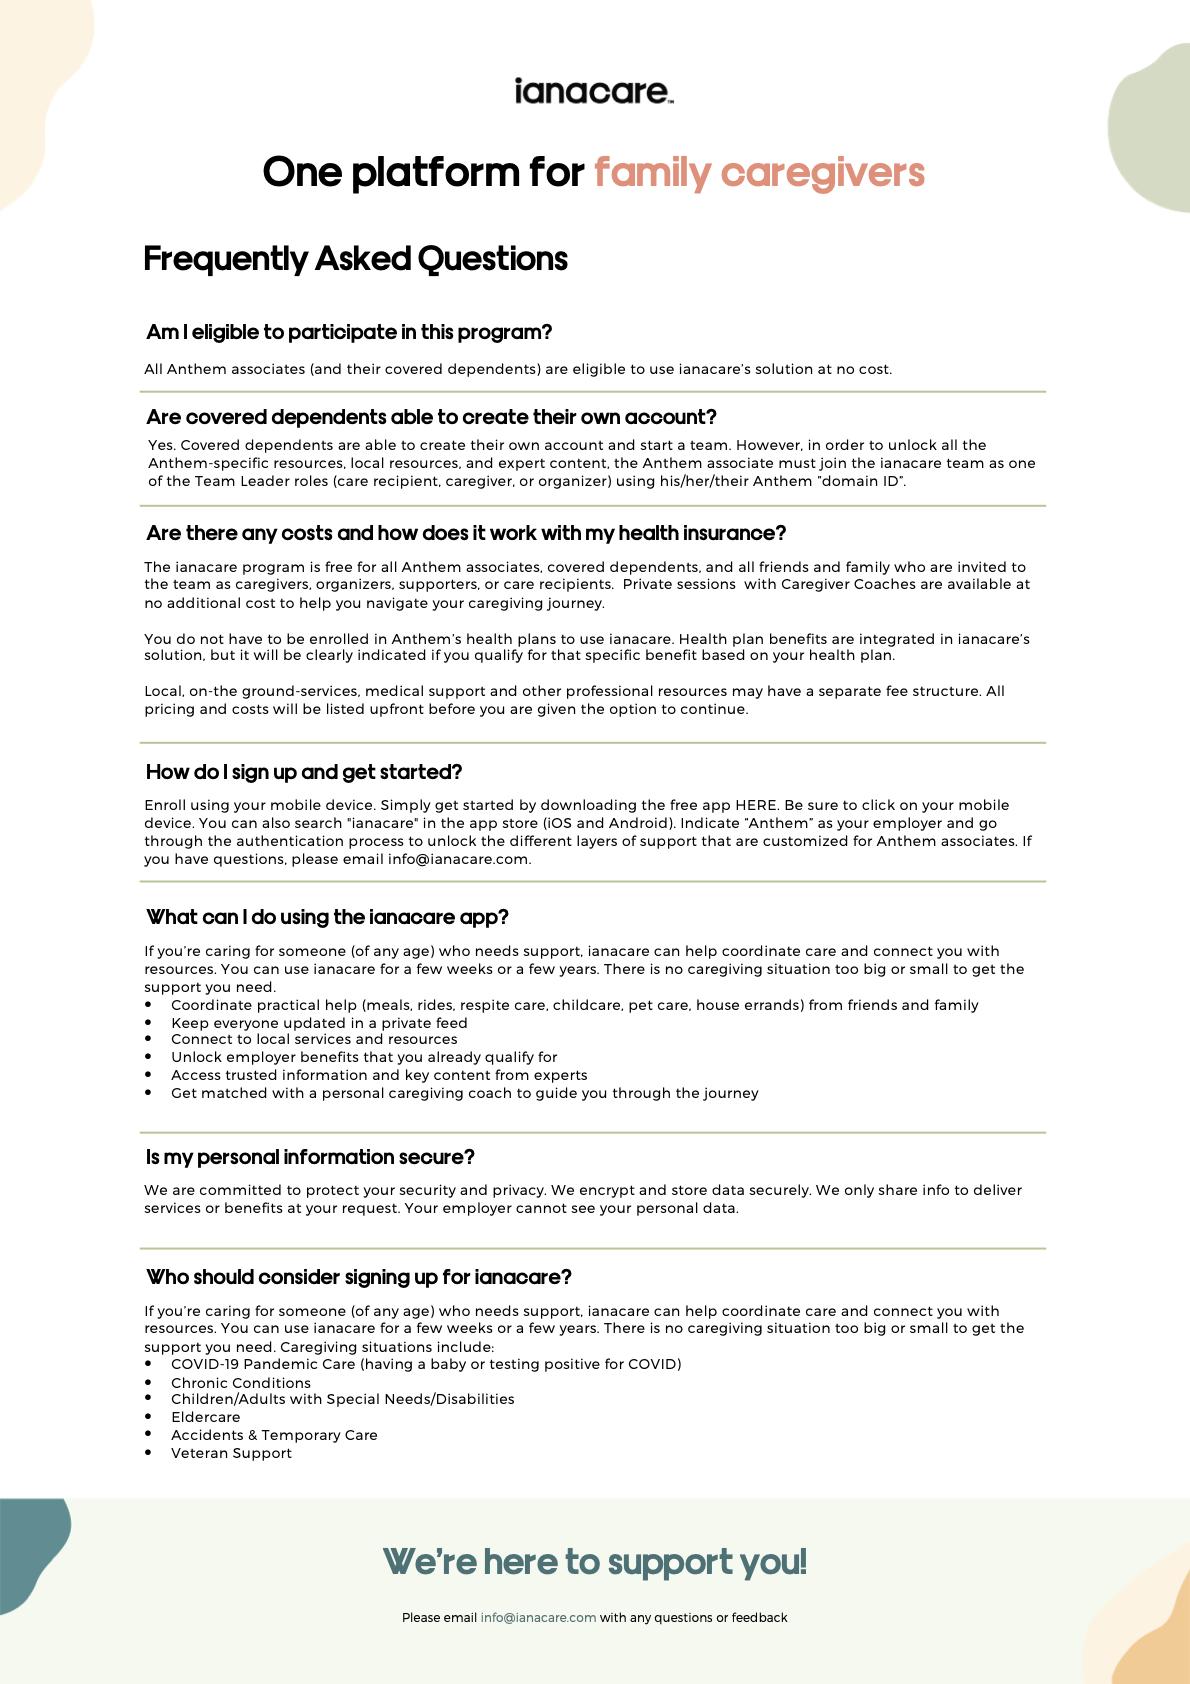 Caregiver Support FAQs